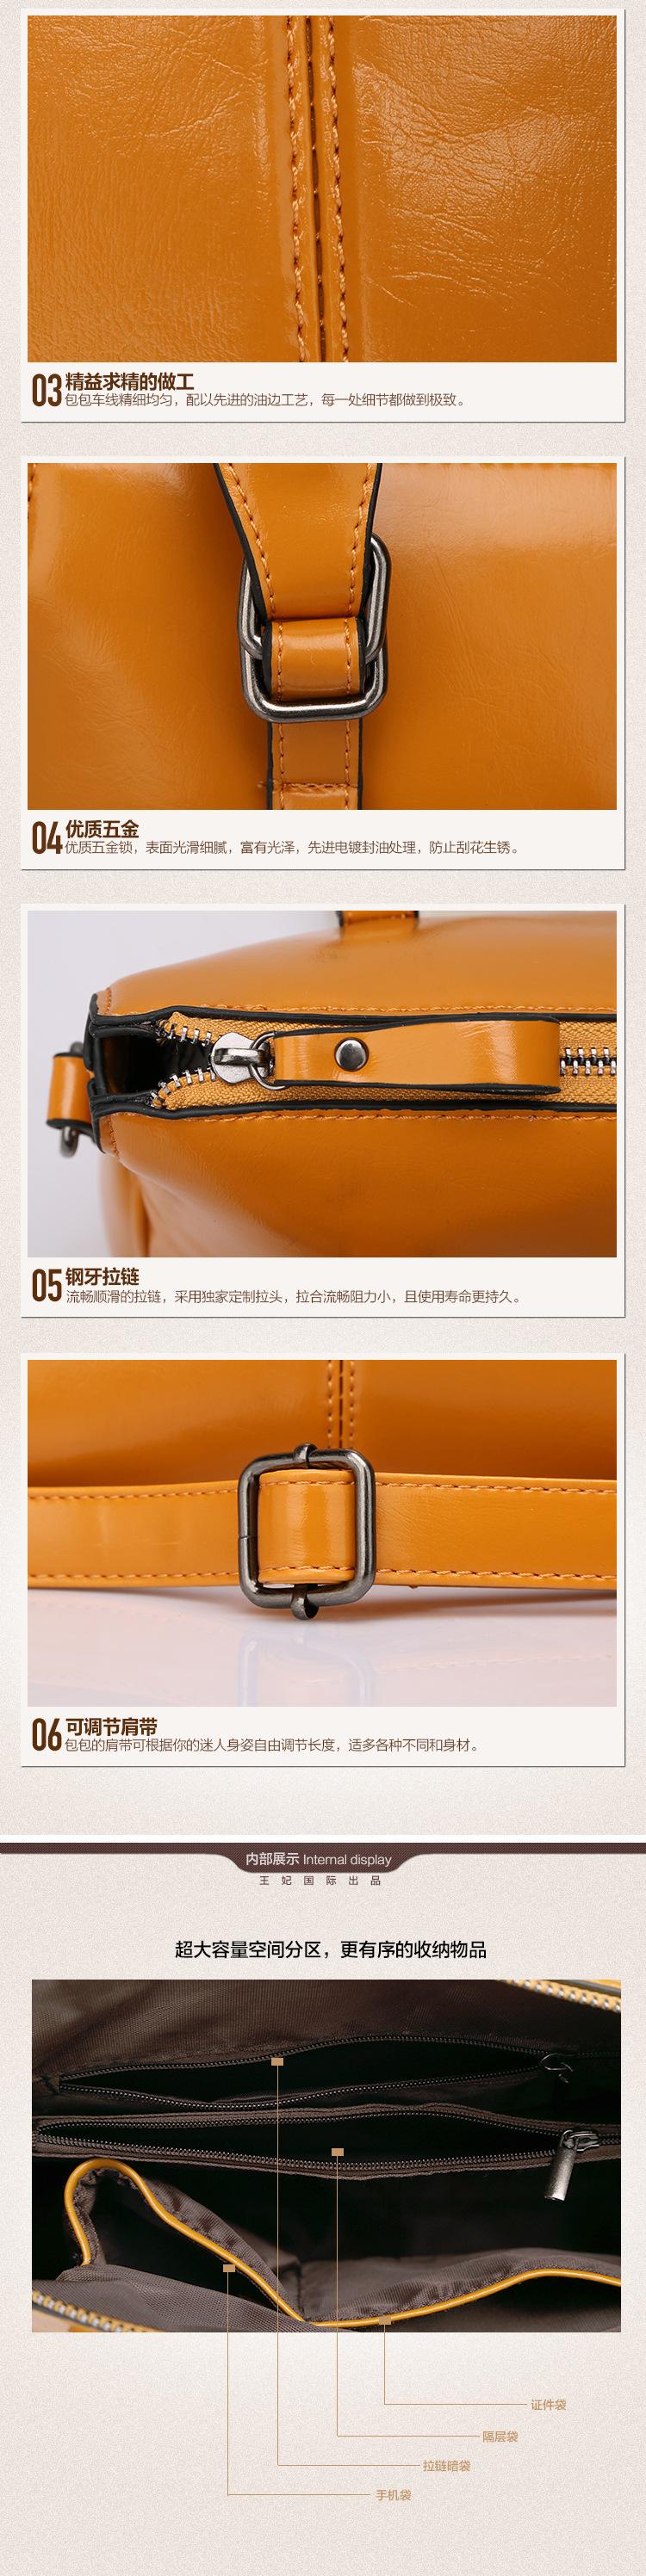 New 2015 Fashion Brand Leather Women Handbag Shoulder Bags Crocodile